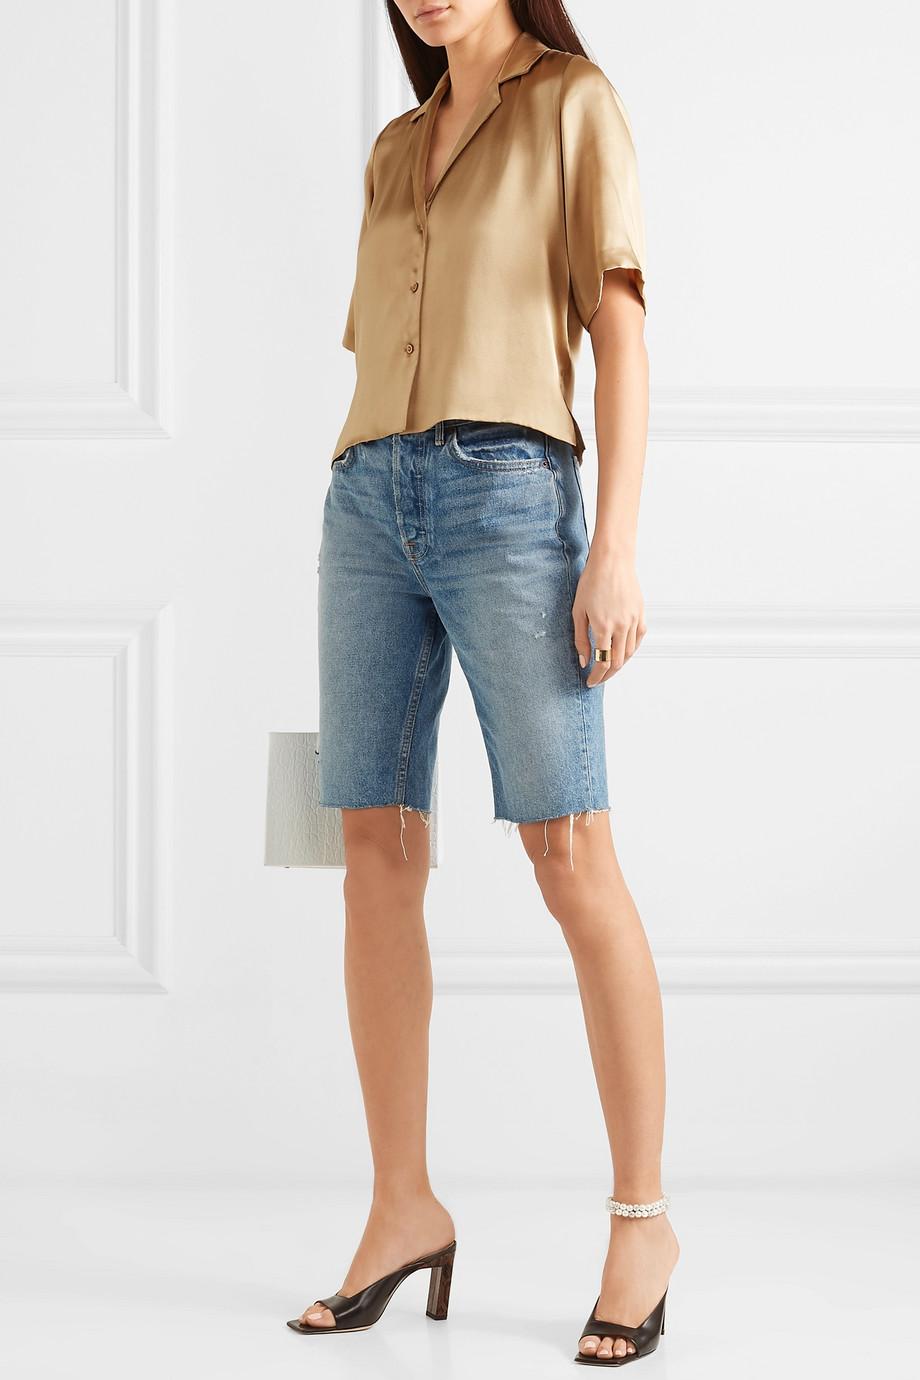 Orseund Iris Le Funk silk-satin shirt